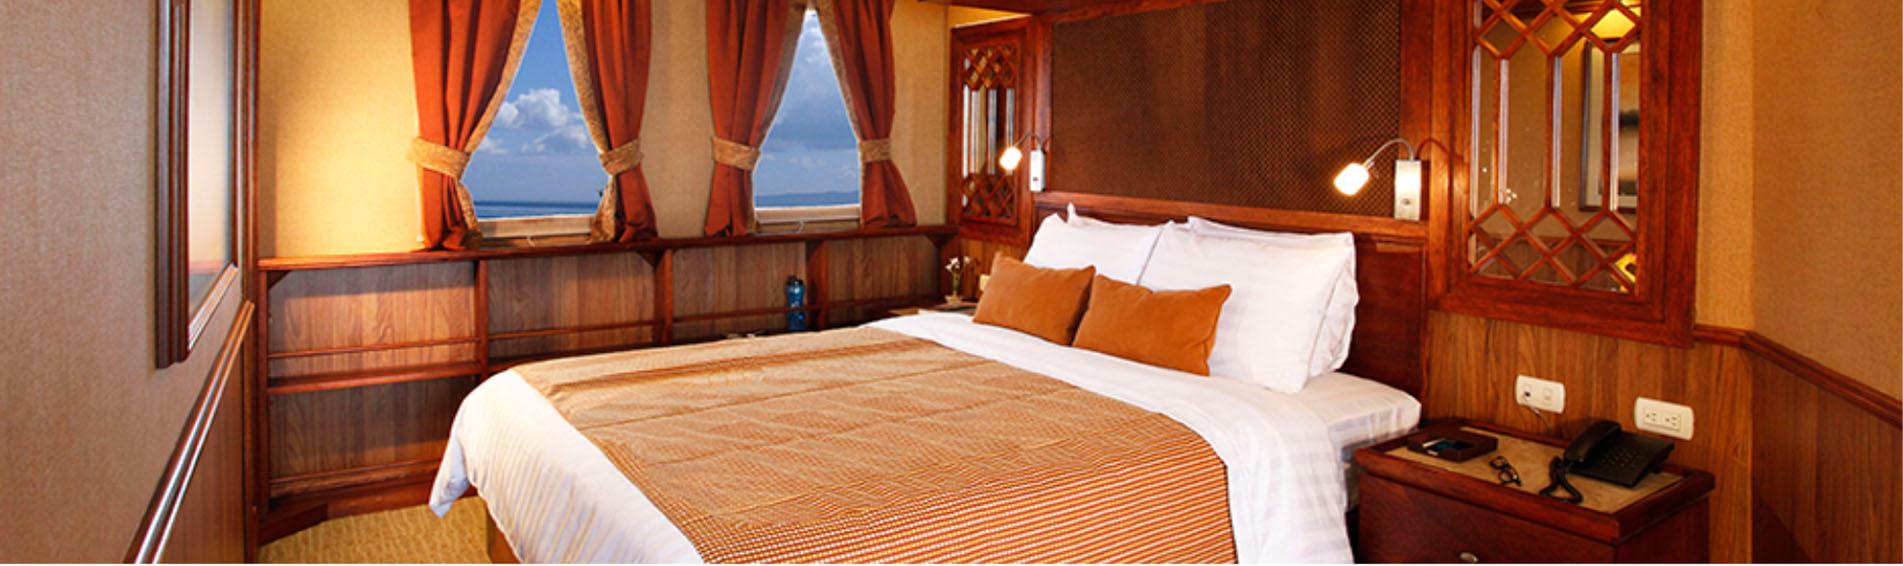 GRACE double bed